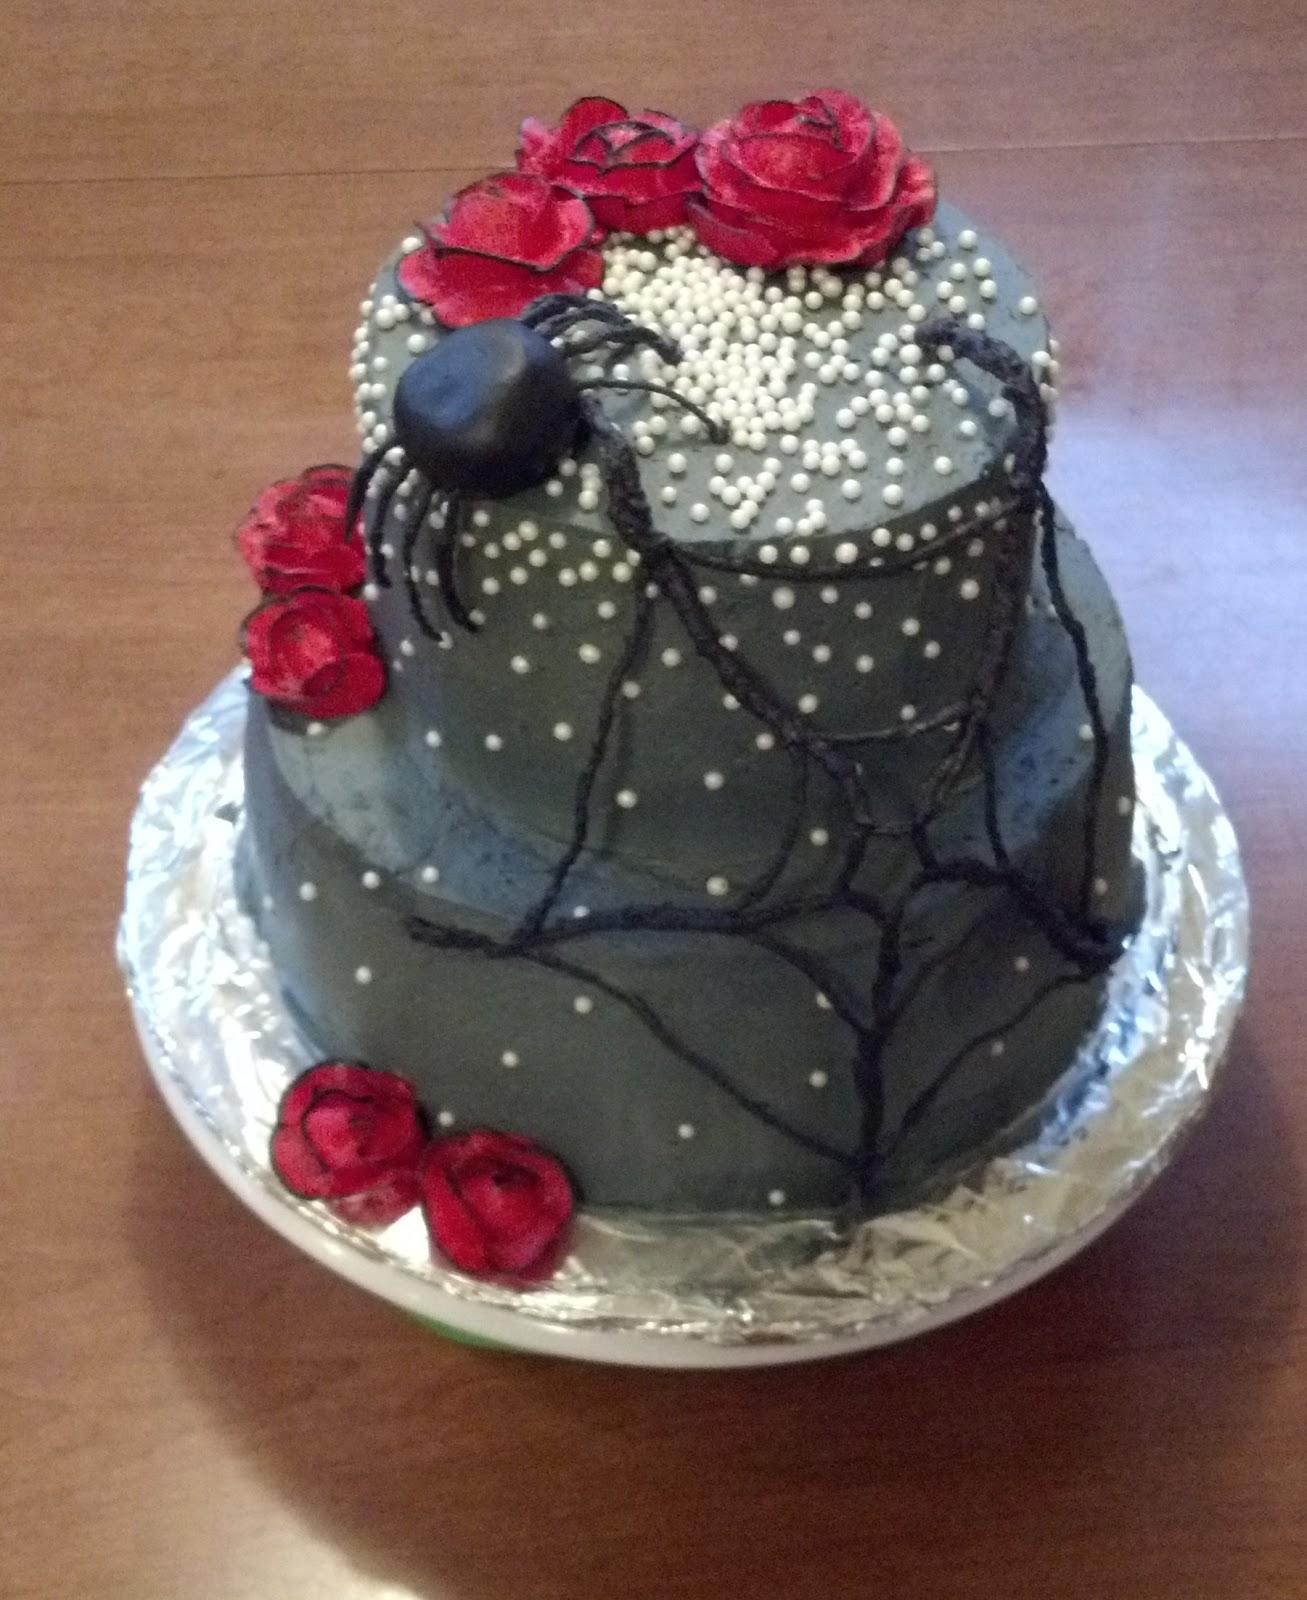 Becca S Baking Blog Halloween 16th Birthday Cake